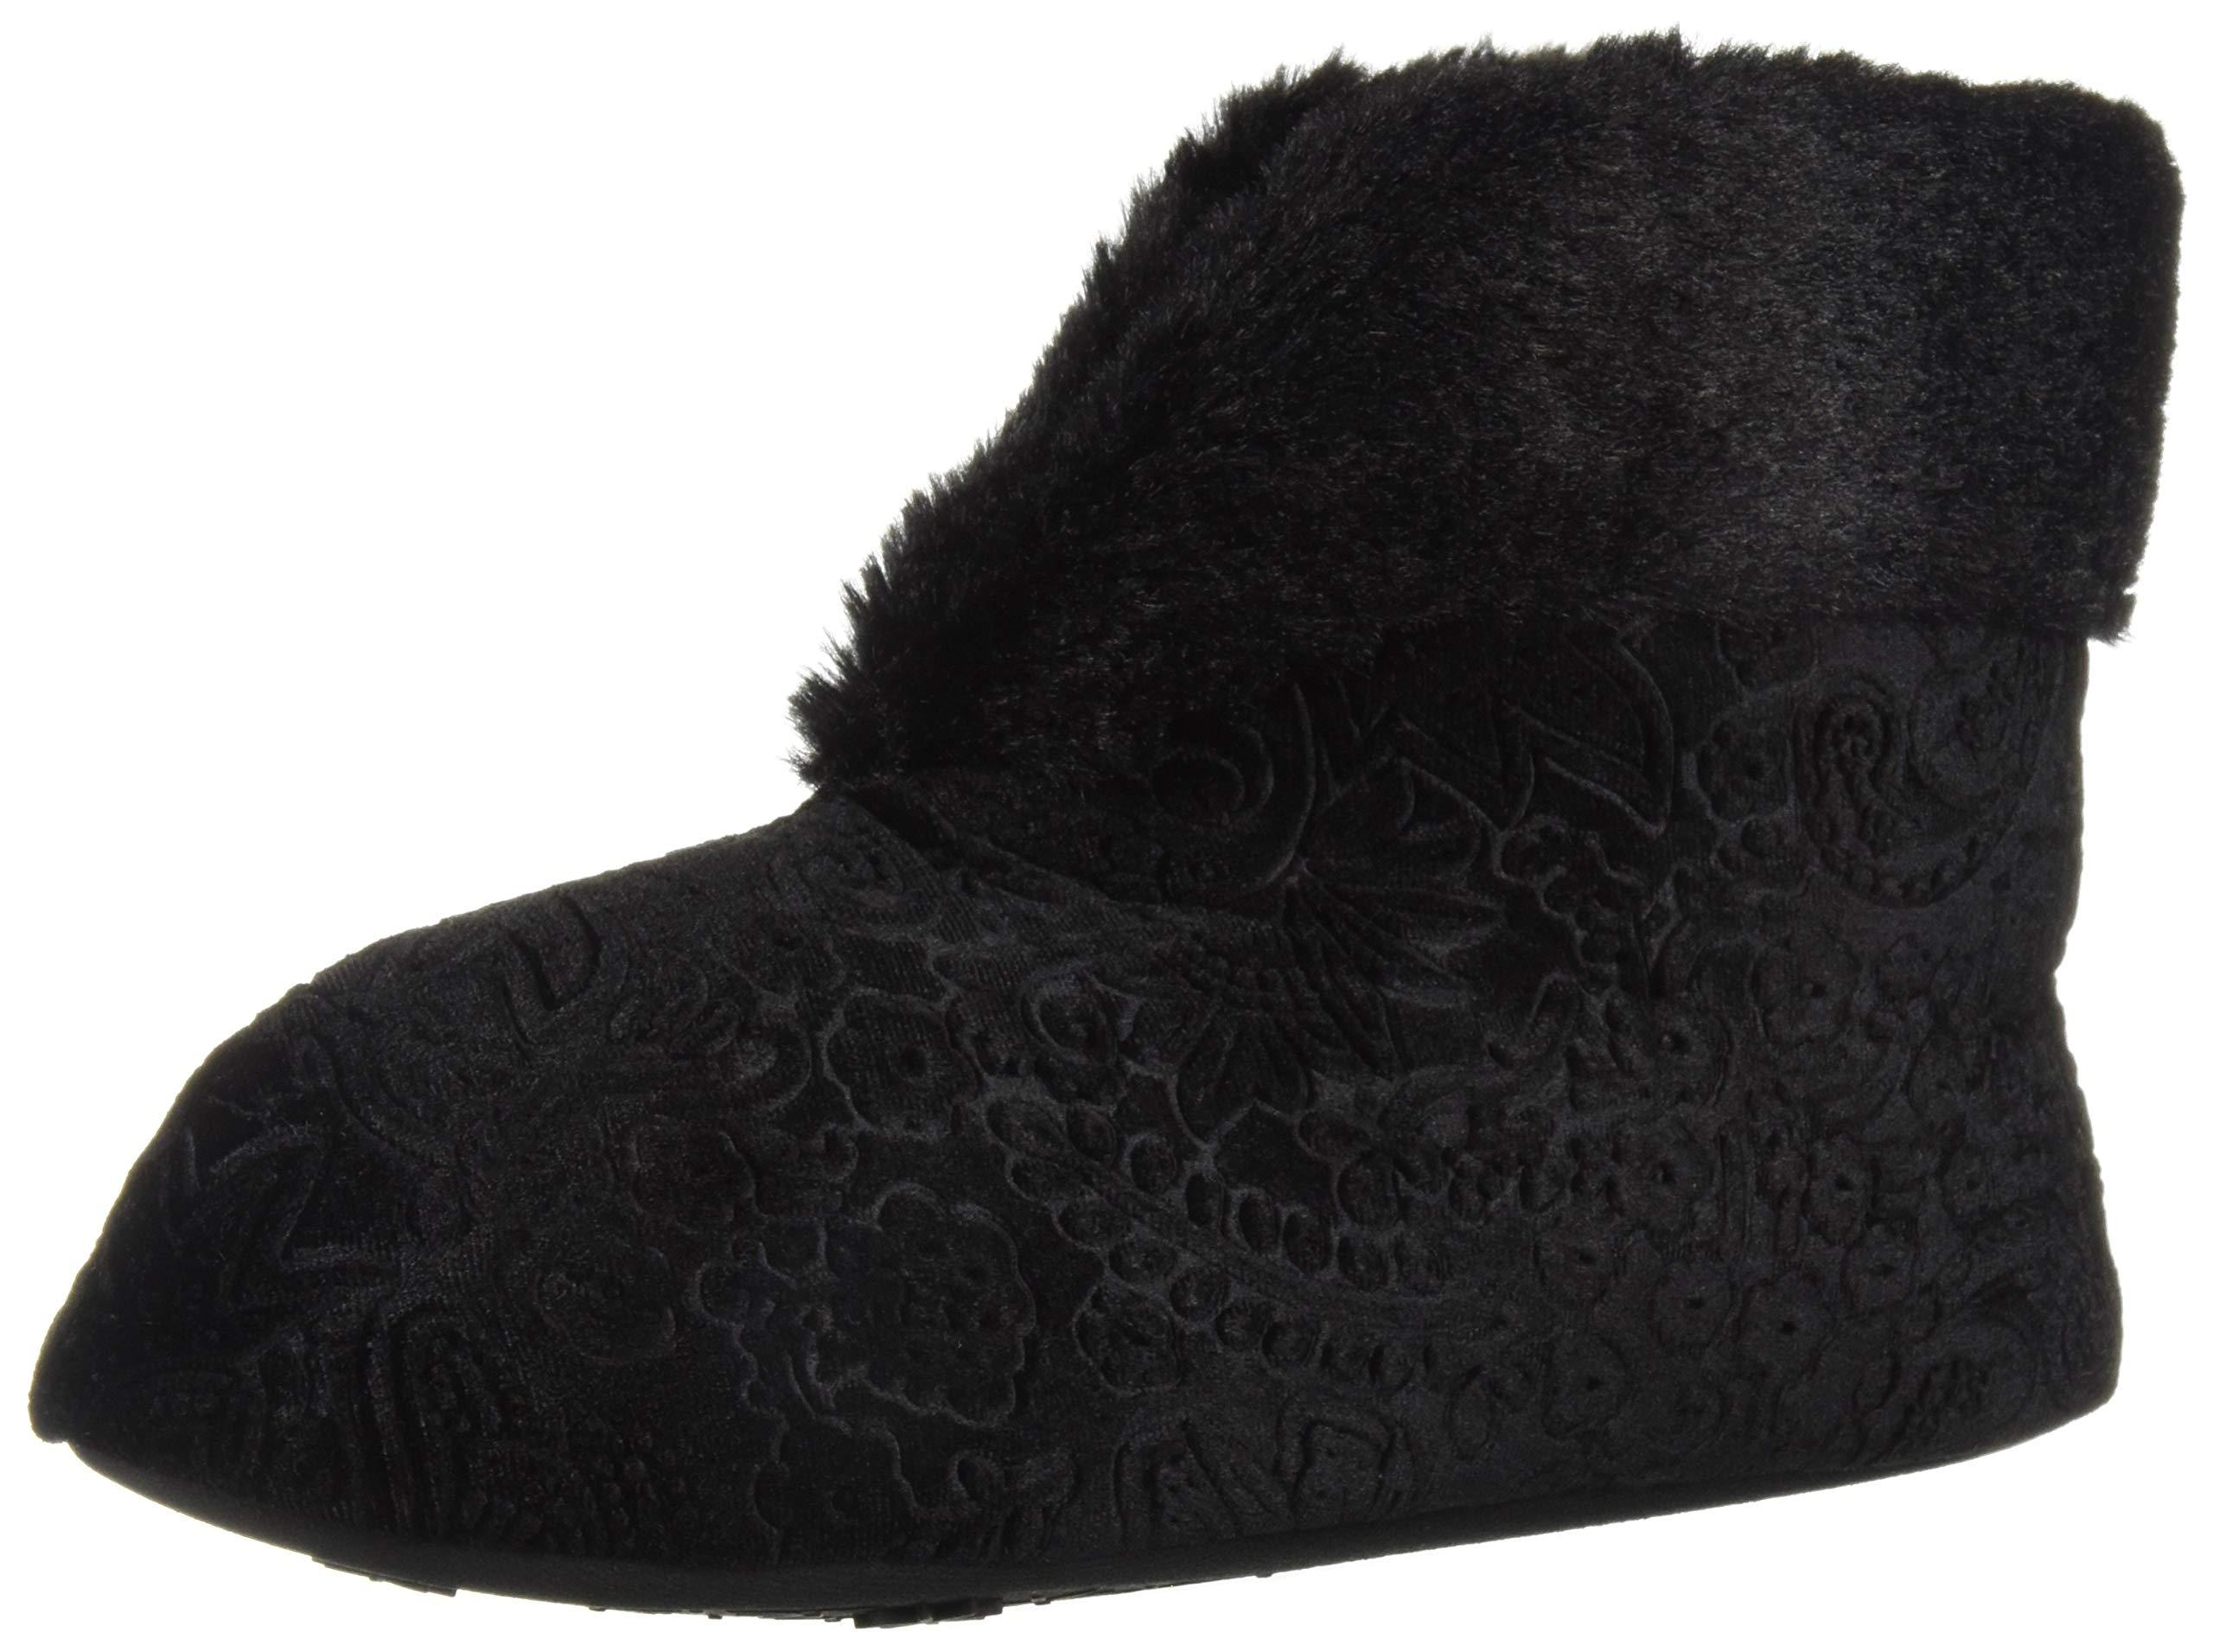 Dearfoams Women's Embossed Velour Bootie Slipper, Black, M Regular US